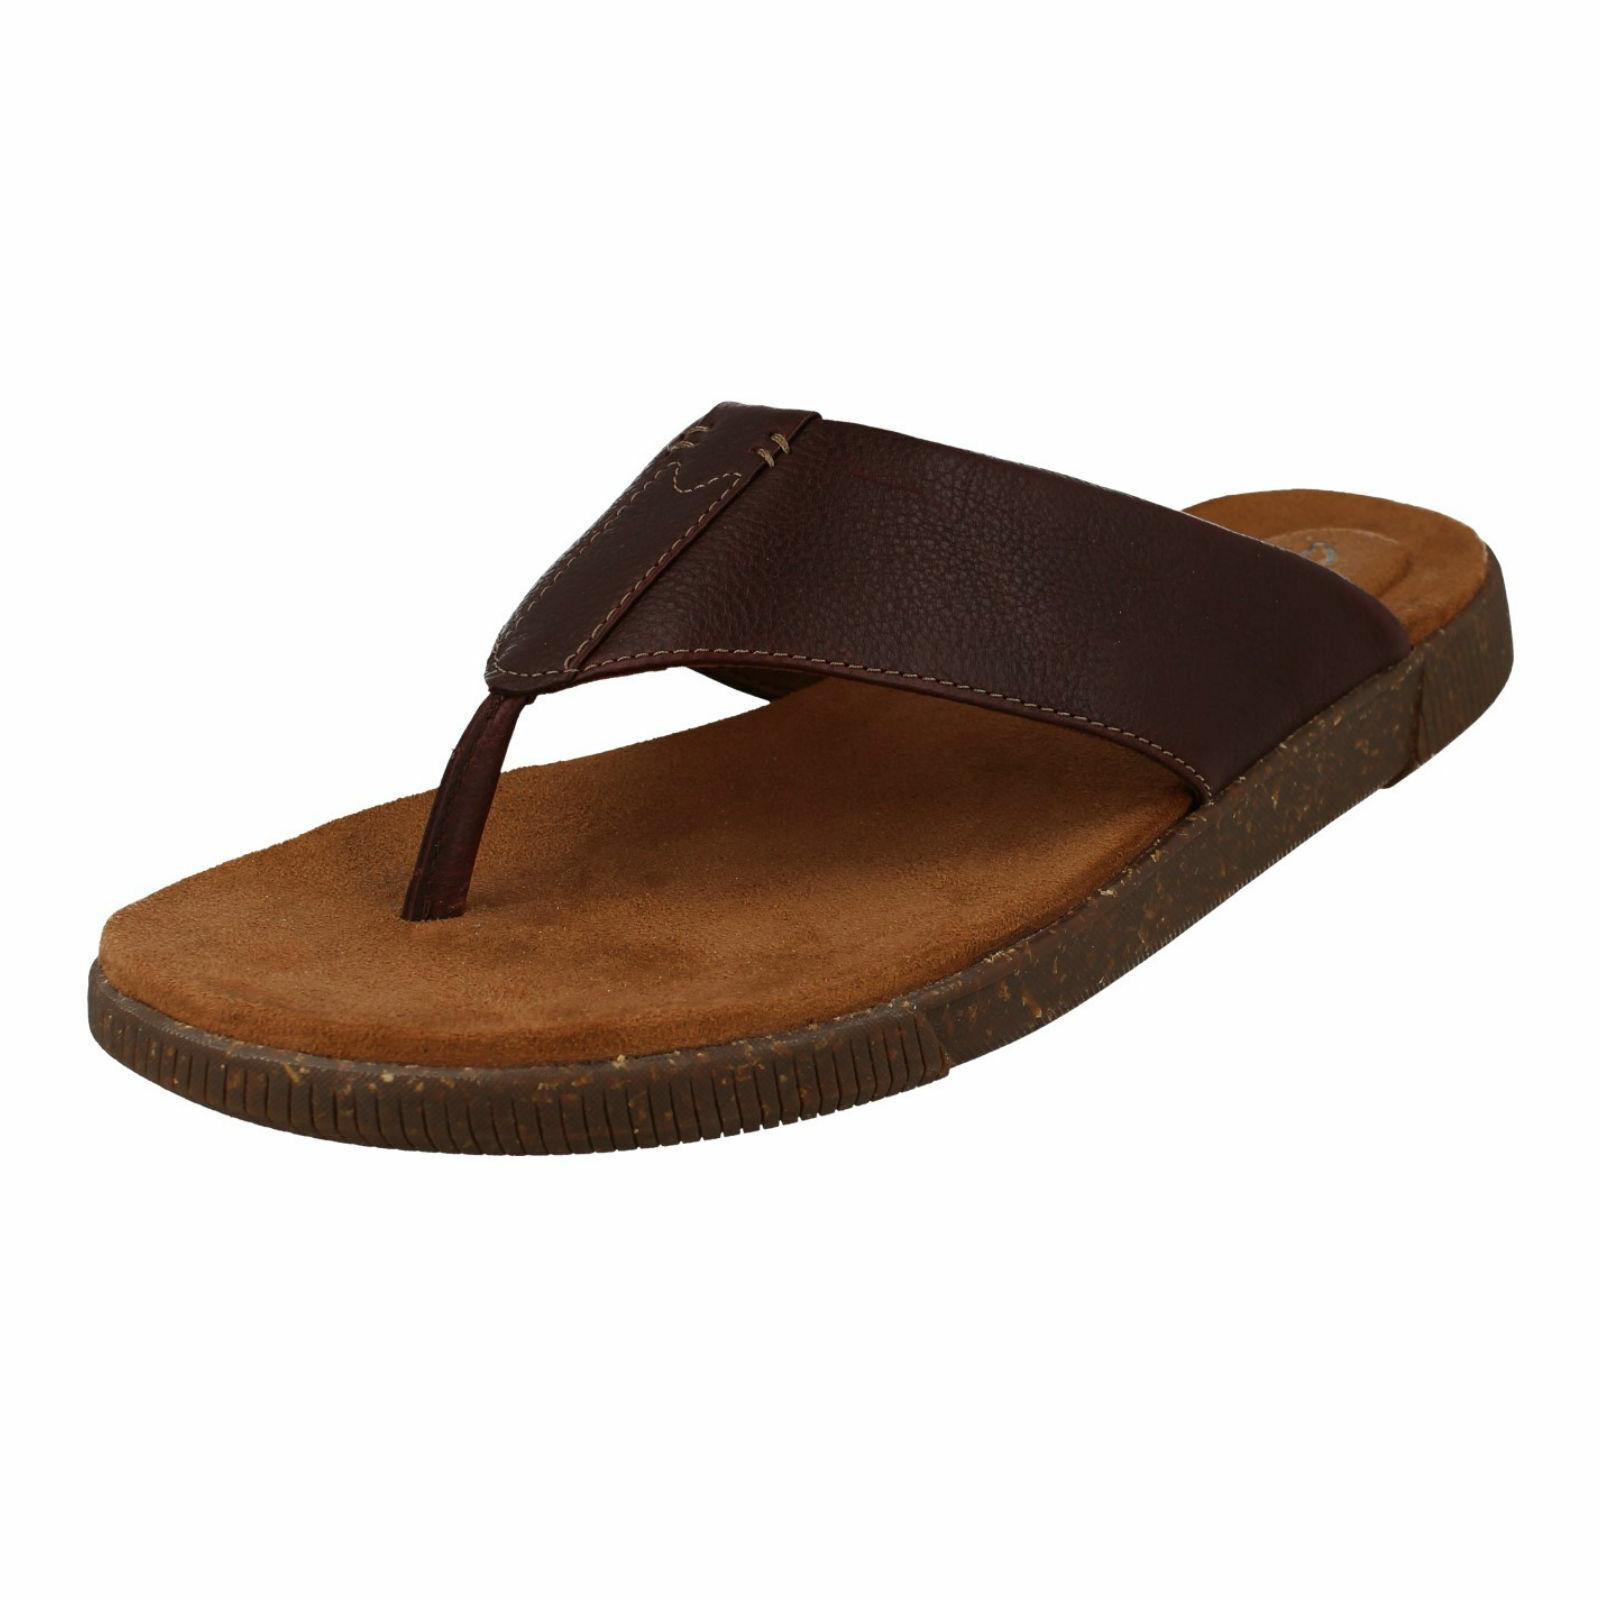 Mens Clarks Beach Casual Hiking Summer Leather Sandals GRAPEVINE OAK